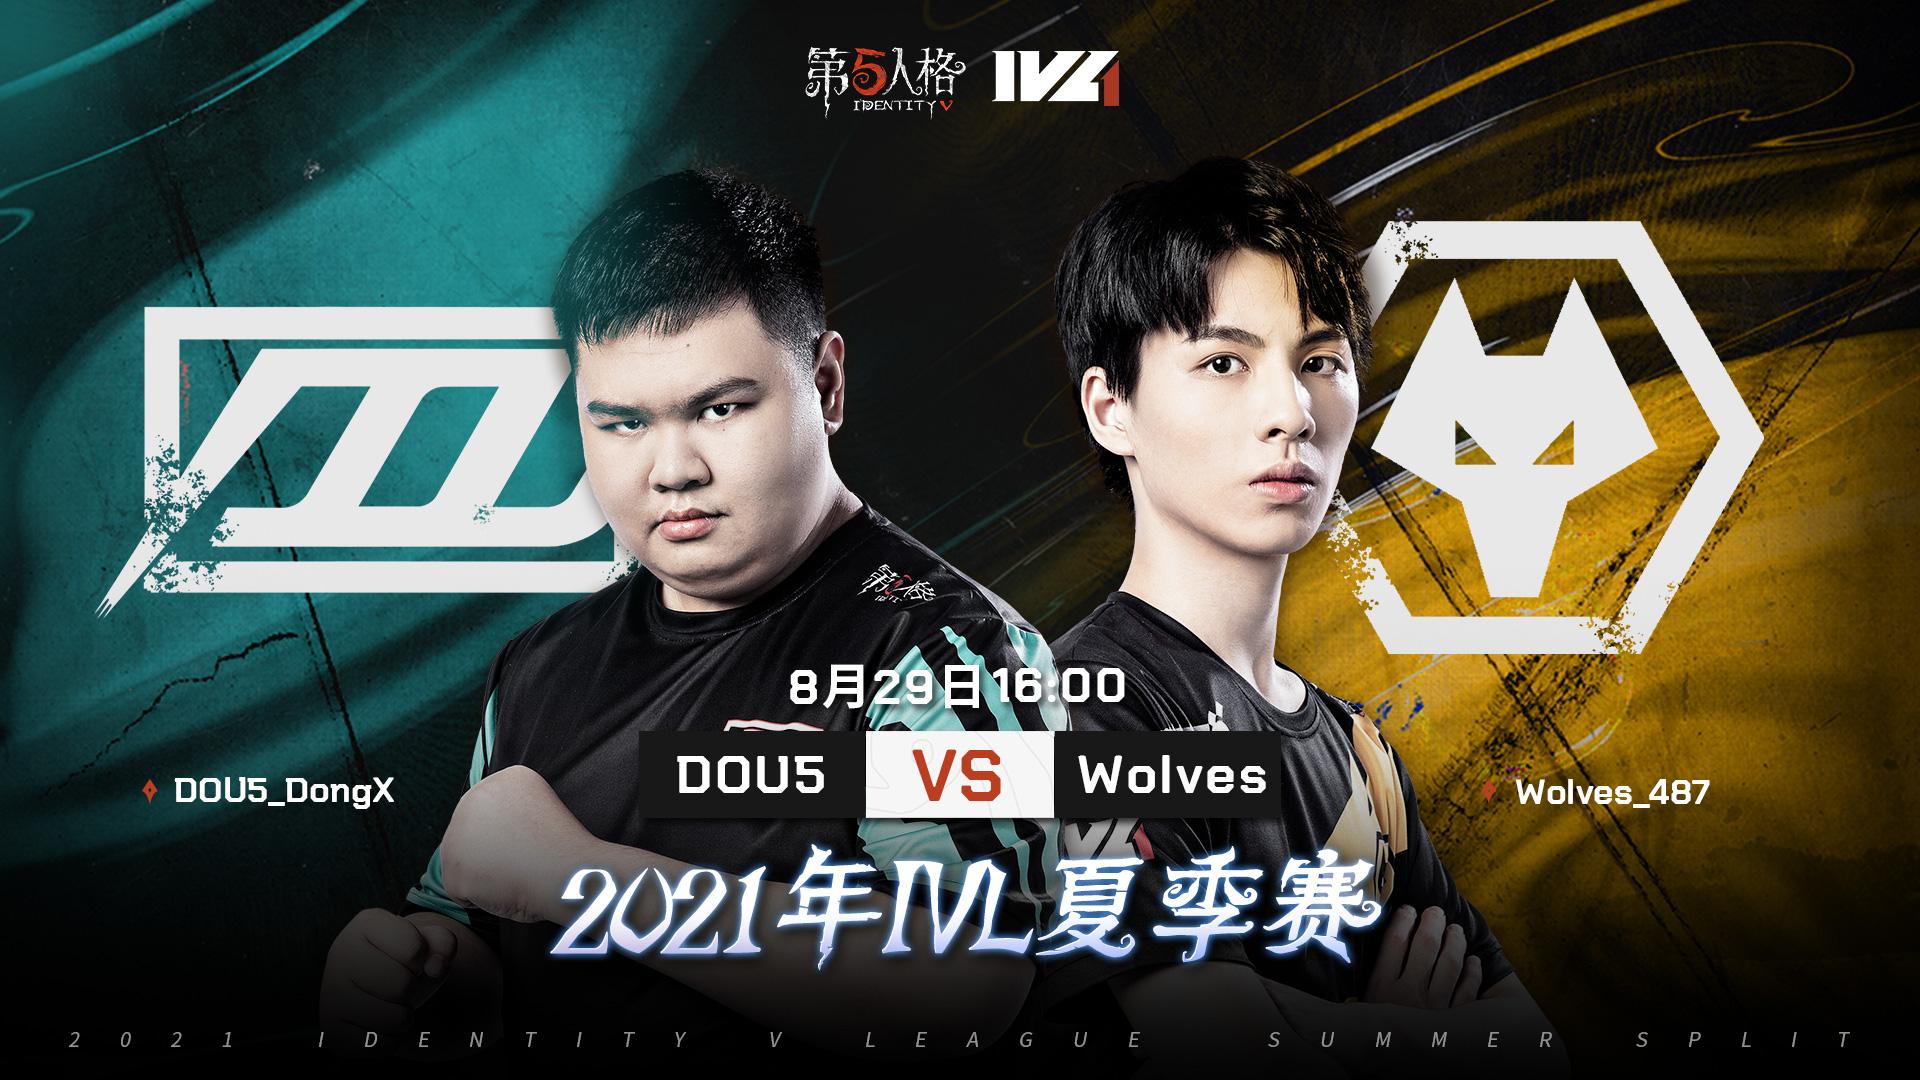 【2021IVL】夏季赛总决赛Day3录像 DOU5 vs Wolves